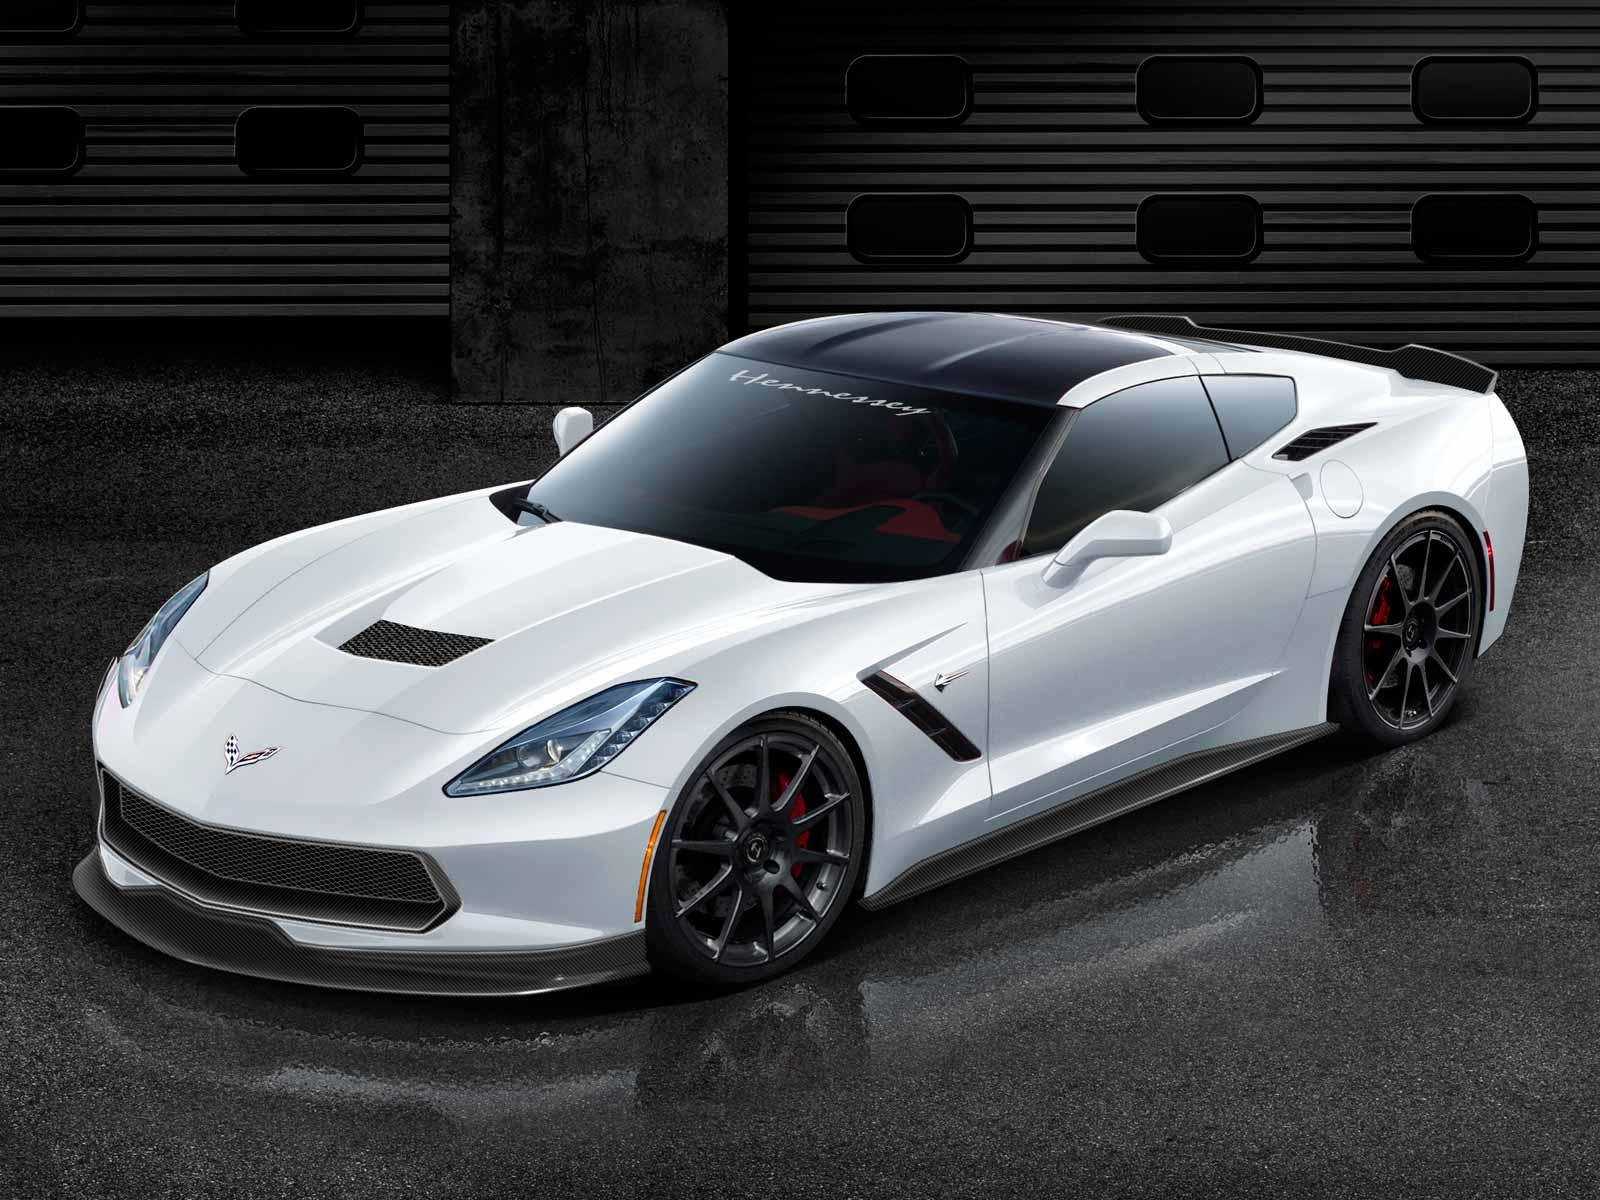 Hennessey Performance Announces Corvette C7 Upgrades